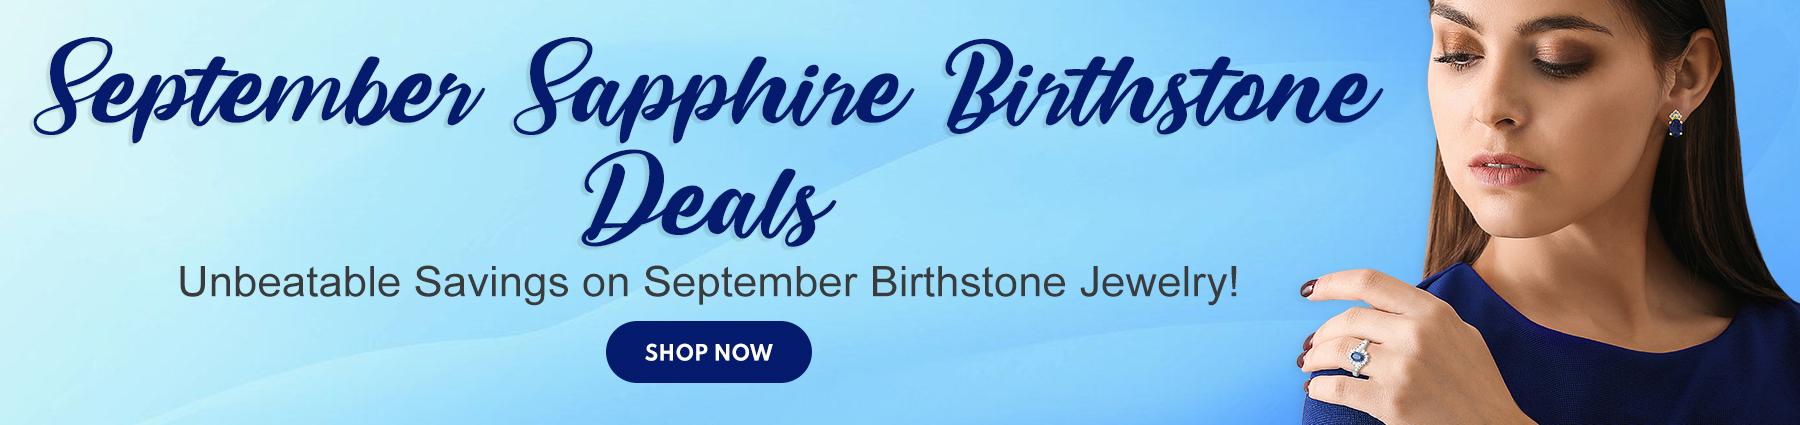 September Sapphire Birthstone Deals